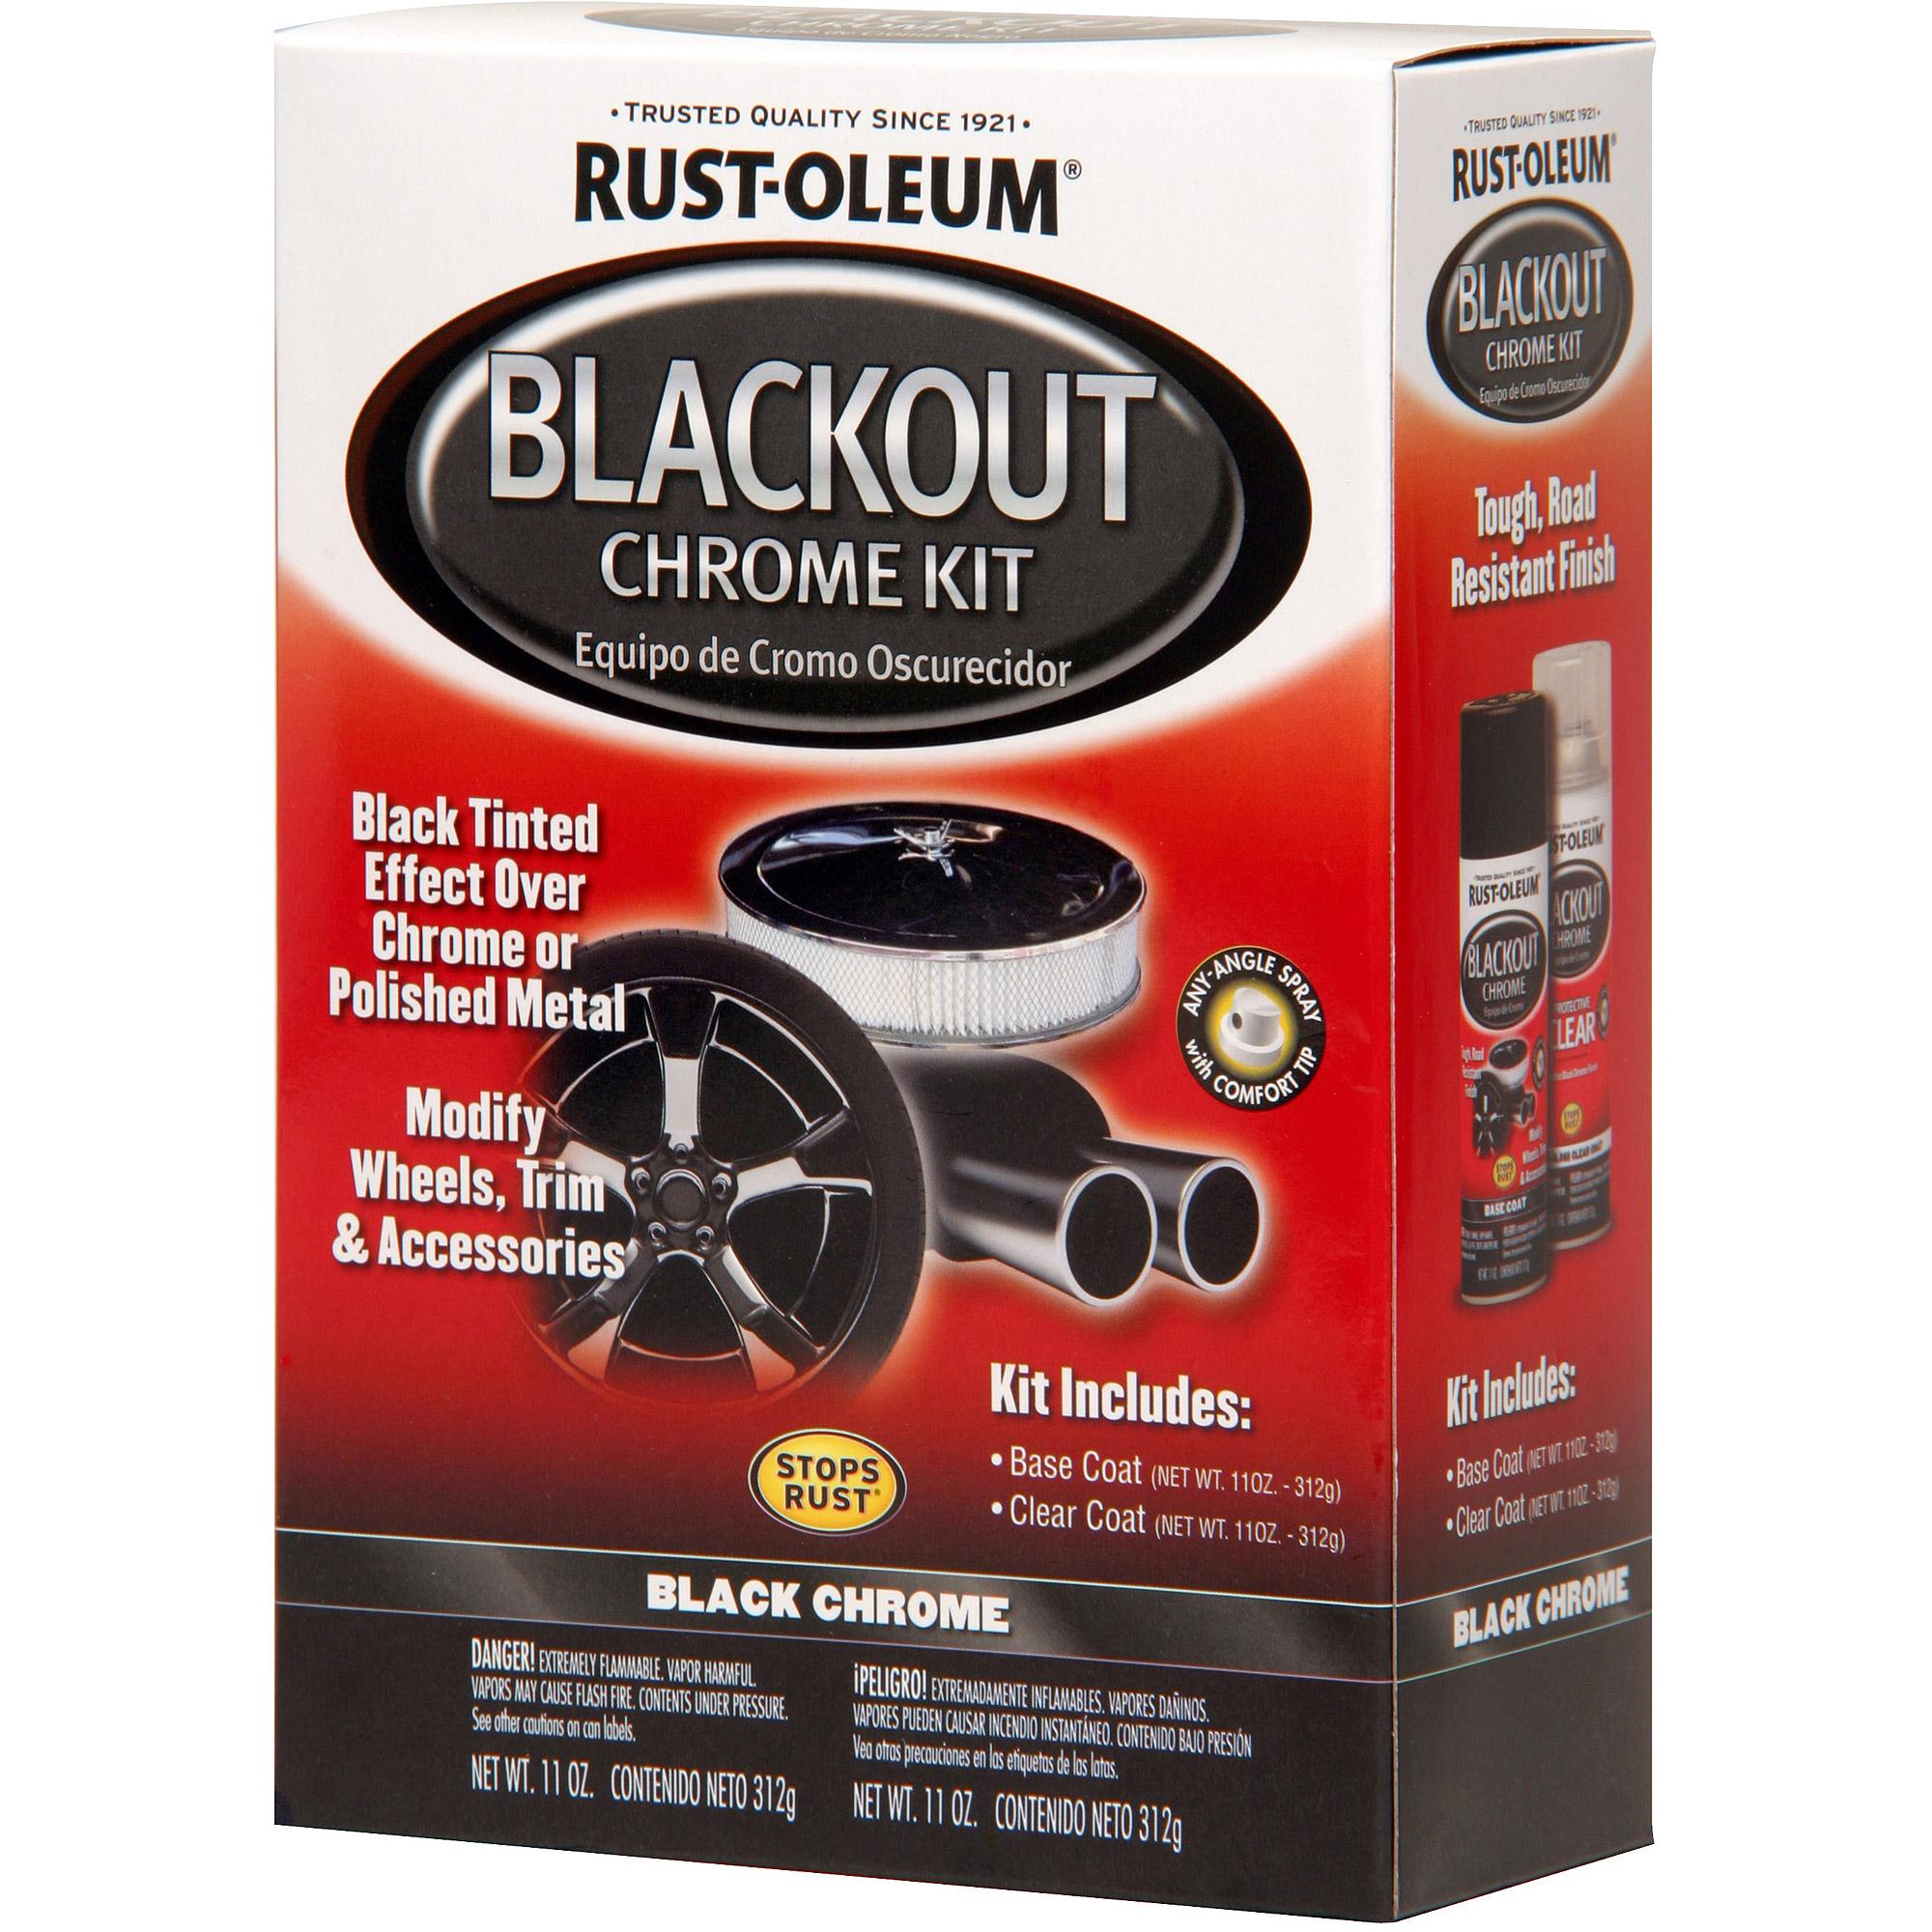 Rust-Oleum Blackout Chrome Kit - Walmart.com